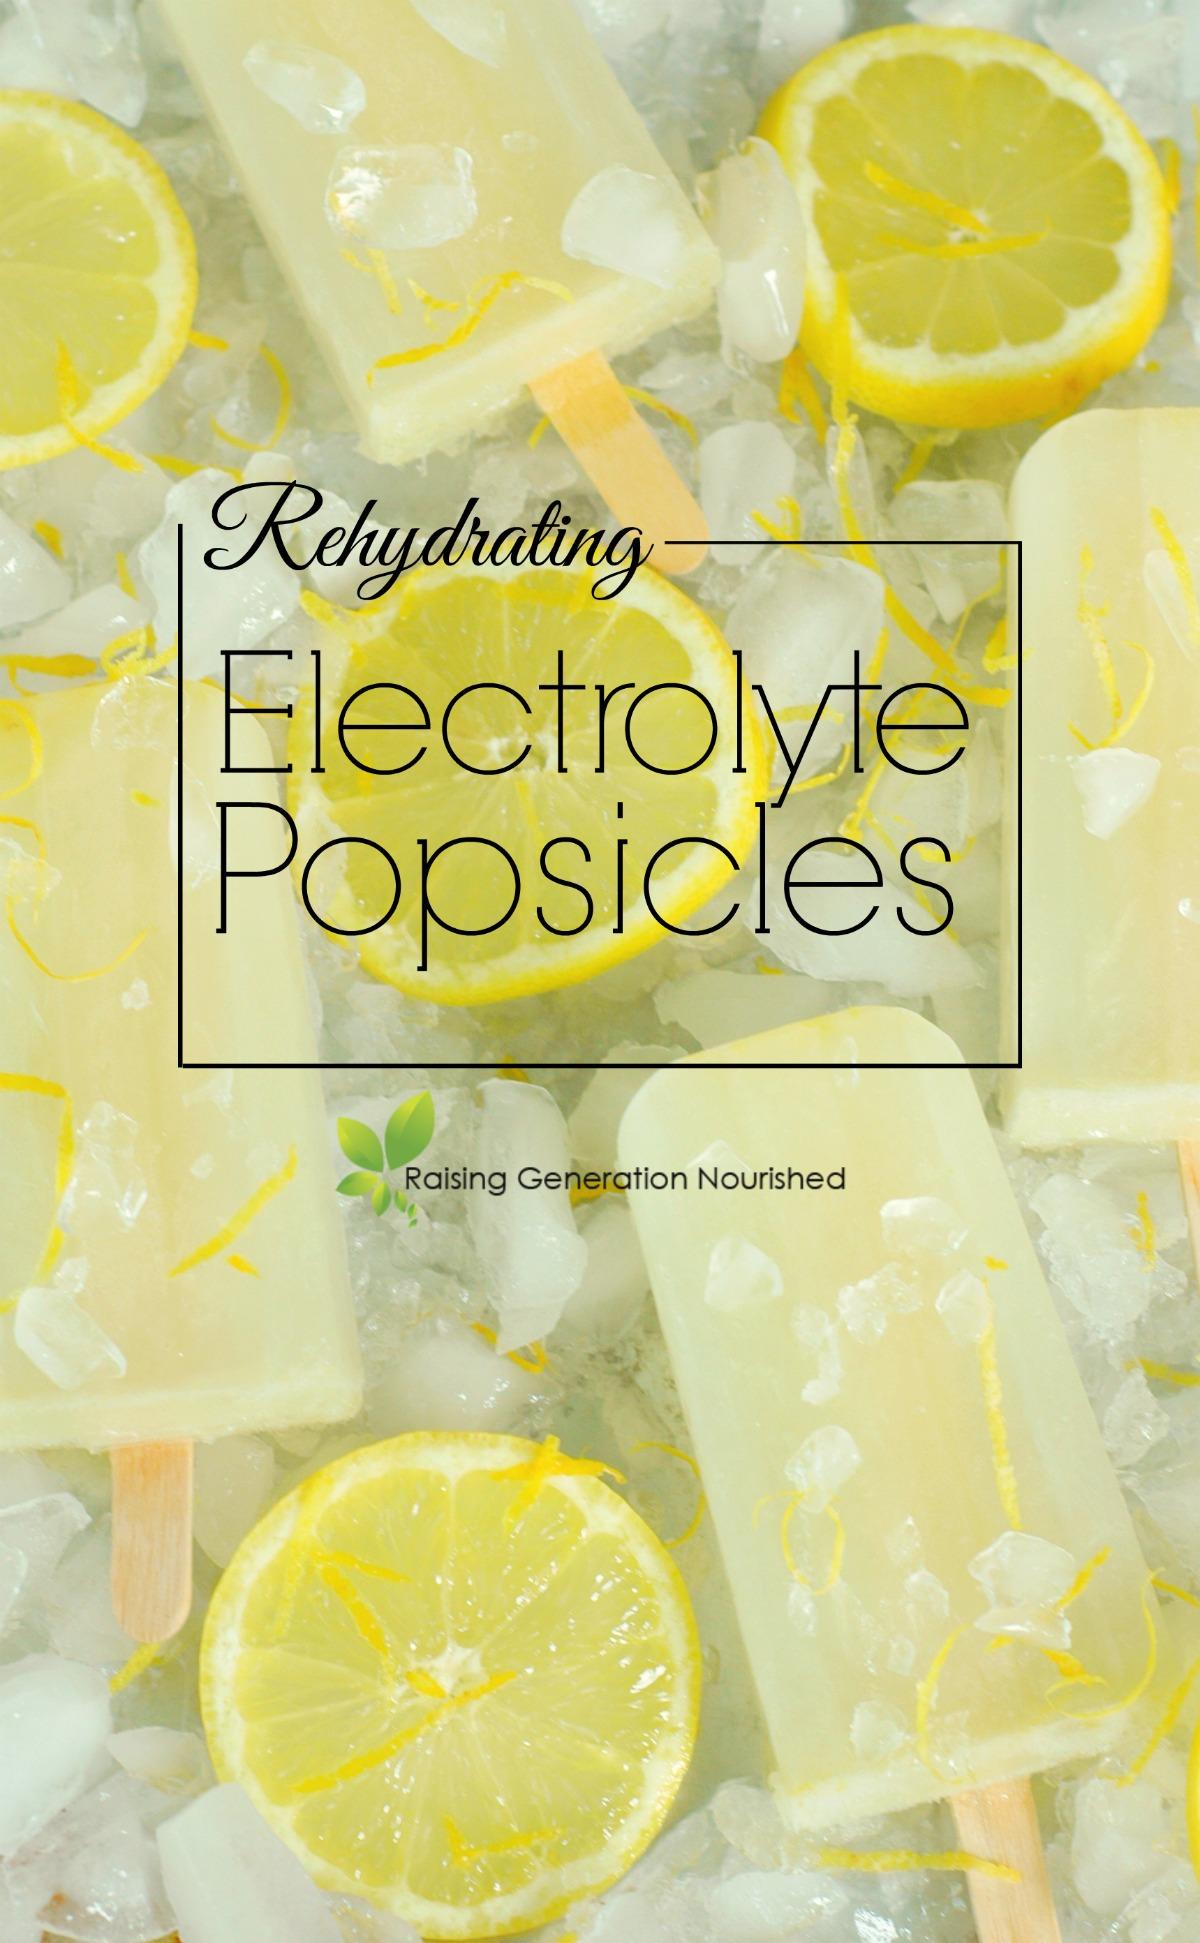 Rehydrating Eletrolyte Popsicles